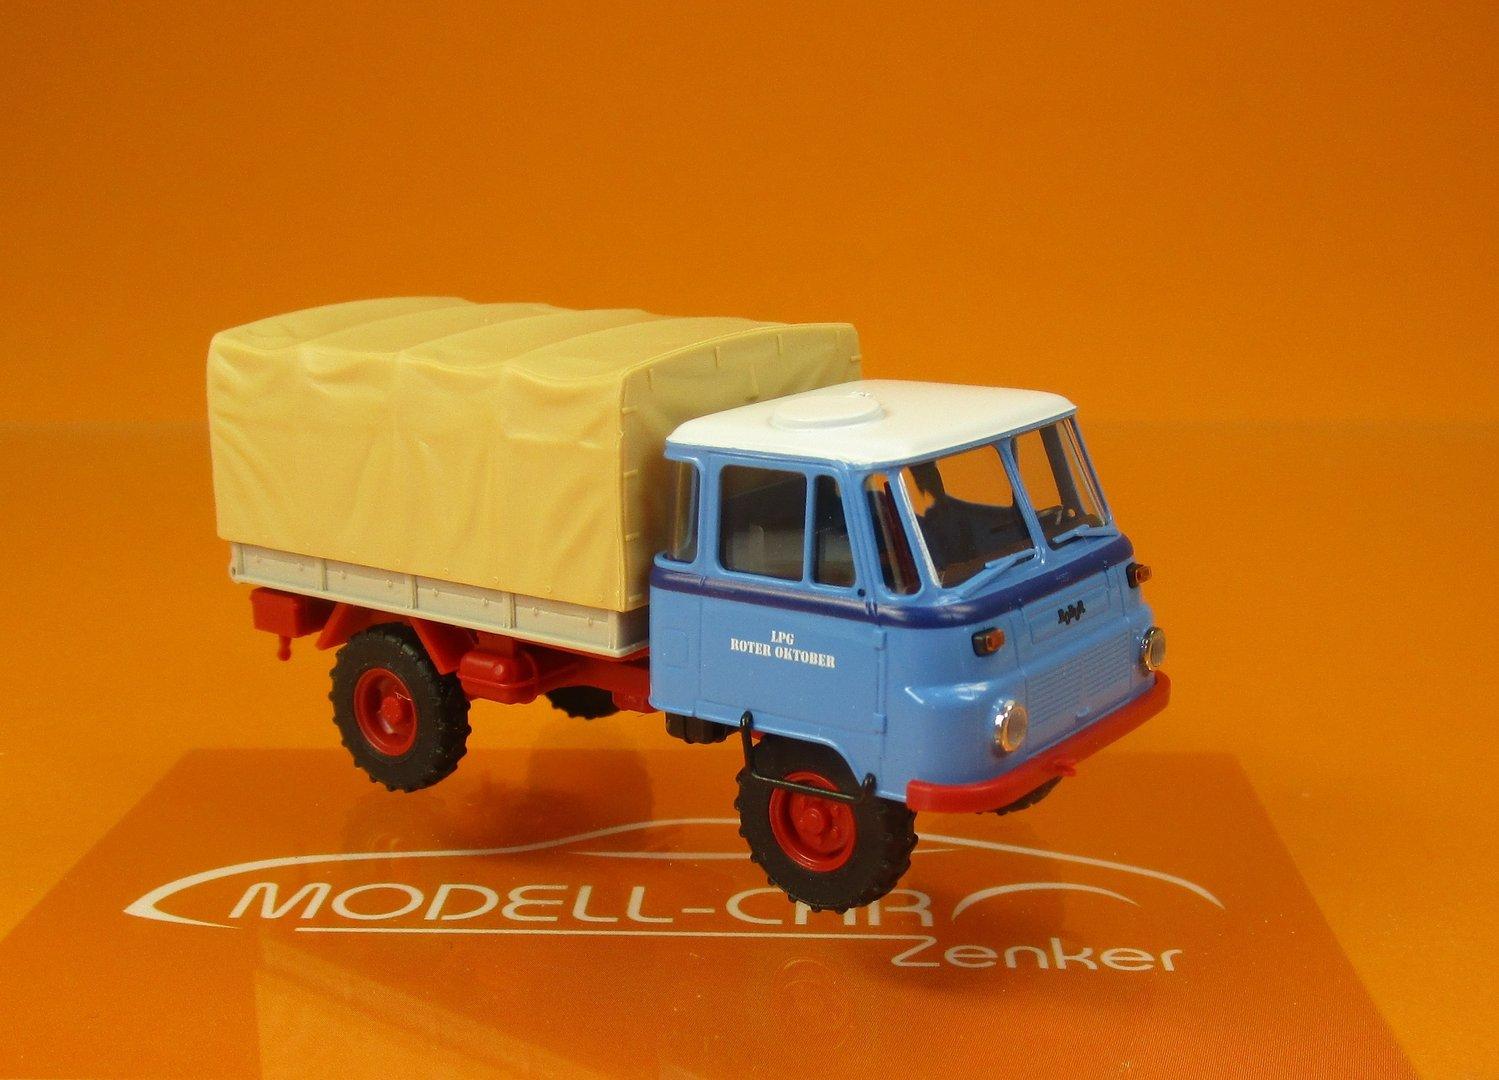 Busch MCZ 03 172 IFA Robur Lo 2002 A Holzpritsche LPG Roter Oktober Scale 1 87